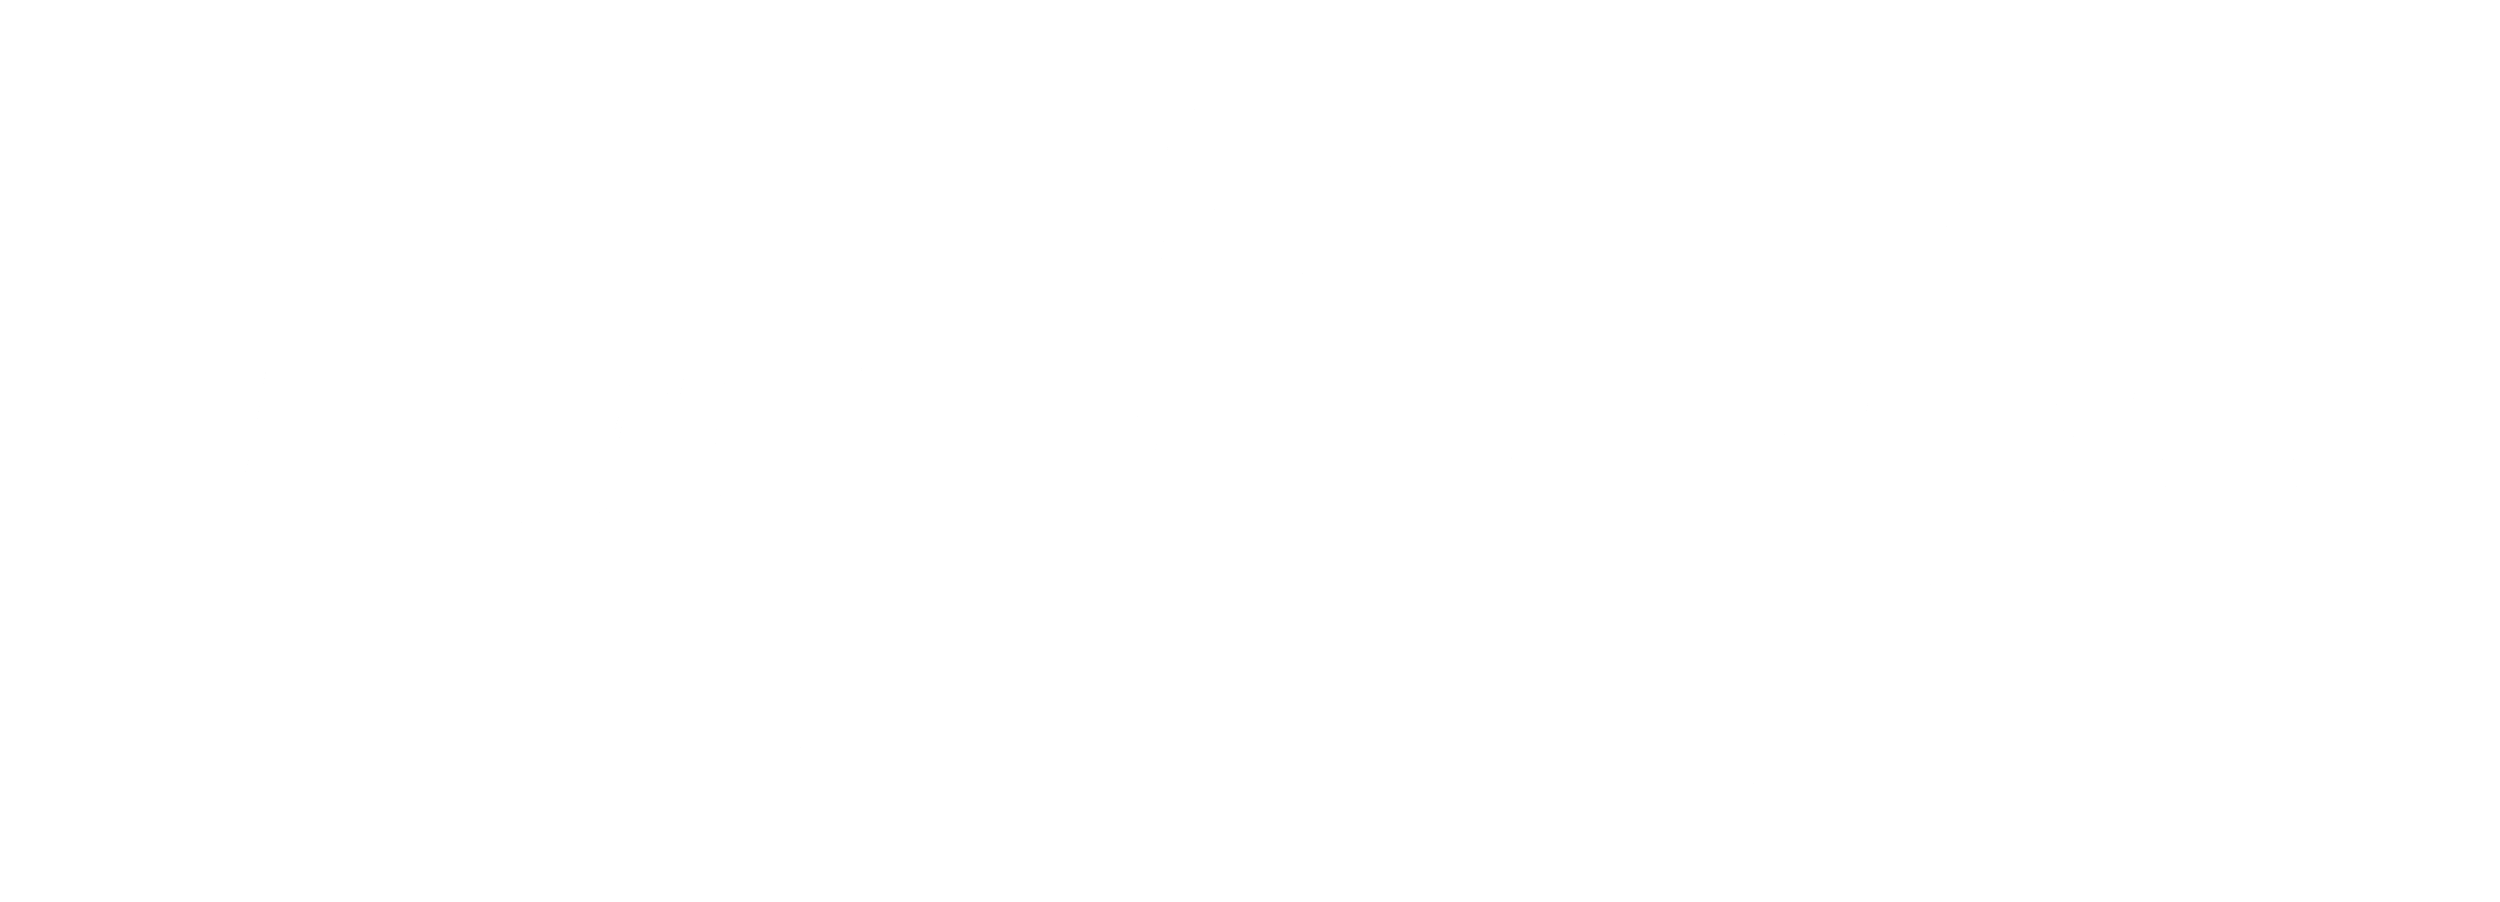 Wrinkle Free Botox Deals uk..png